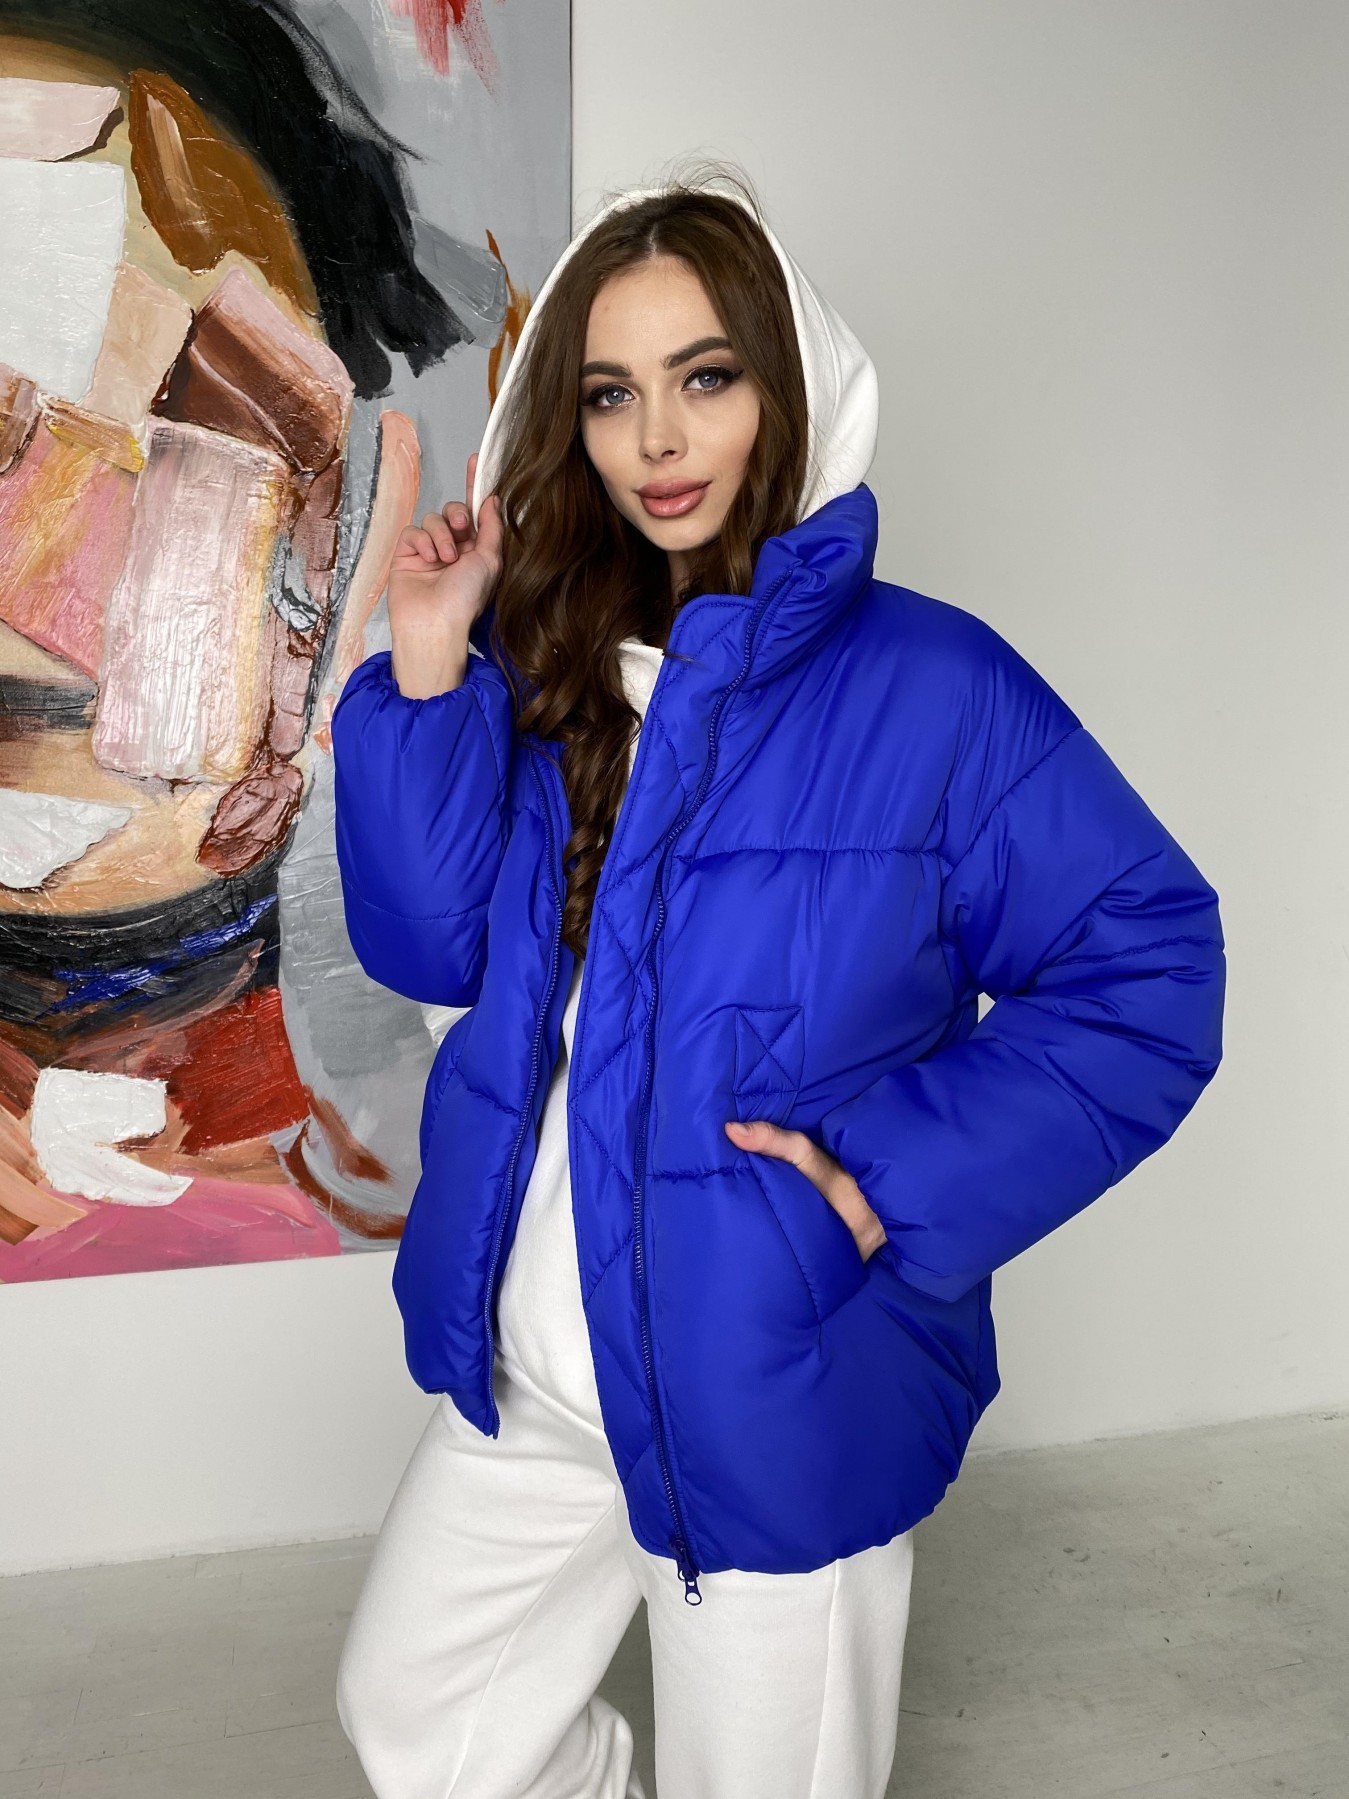 Муд куртка из плащевой ткани 10509 АРТ. 46852 Цвет: Электрик - фото 6, интернет магазин tm-modus.ru